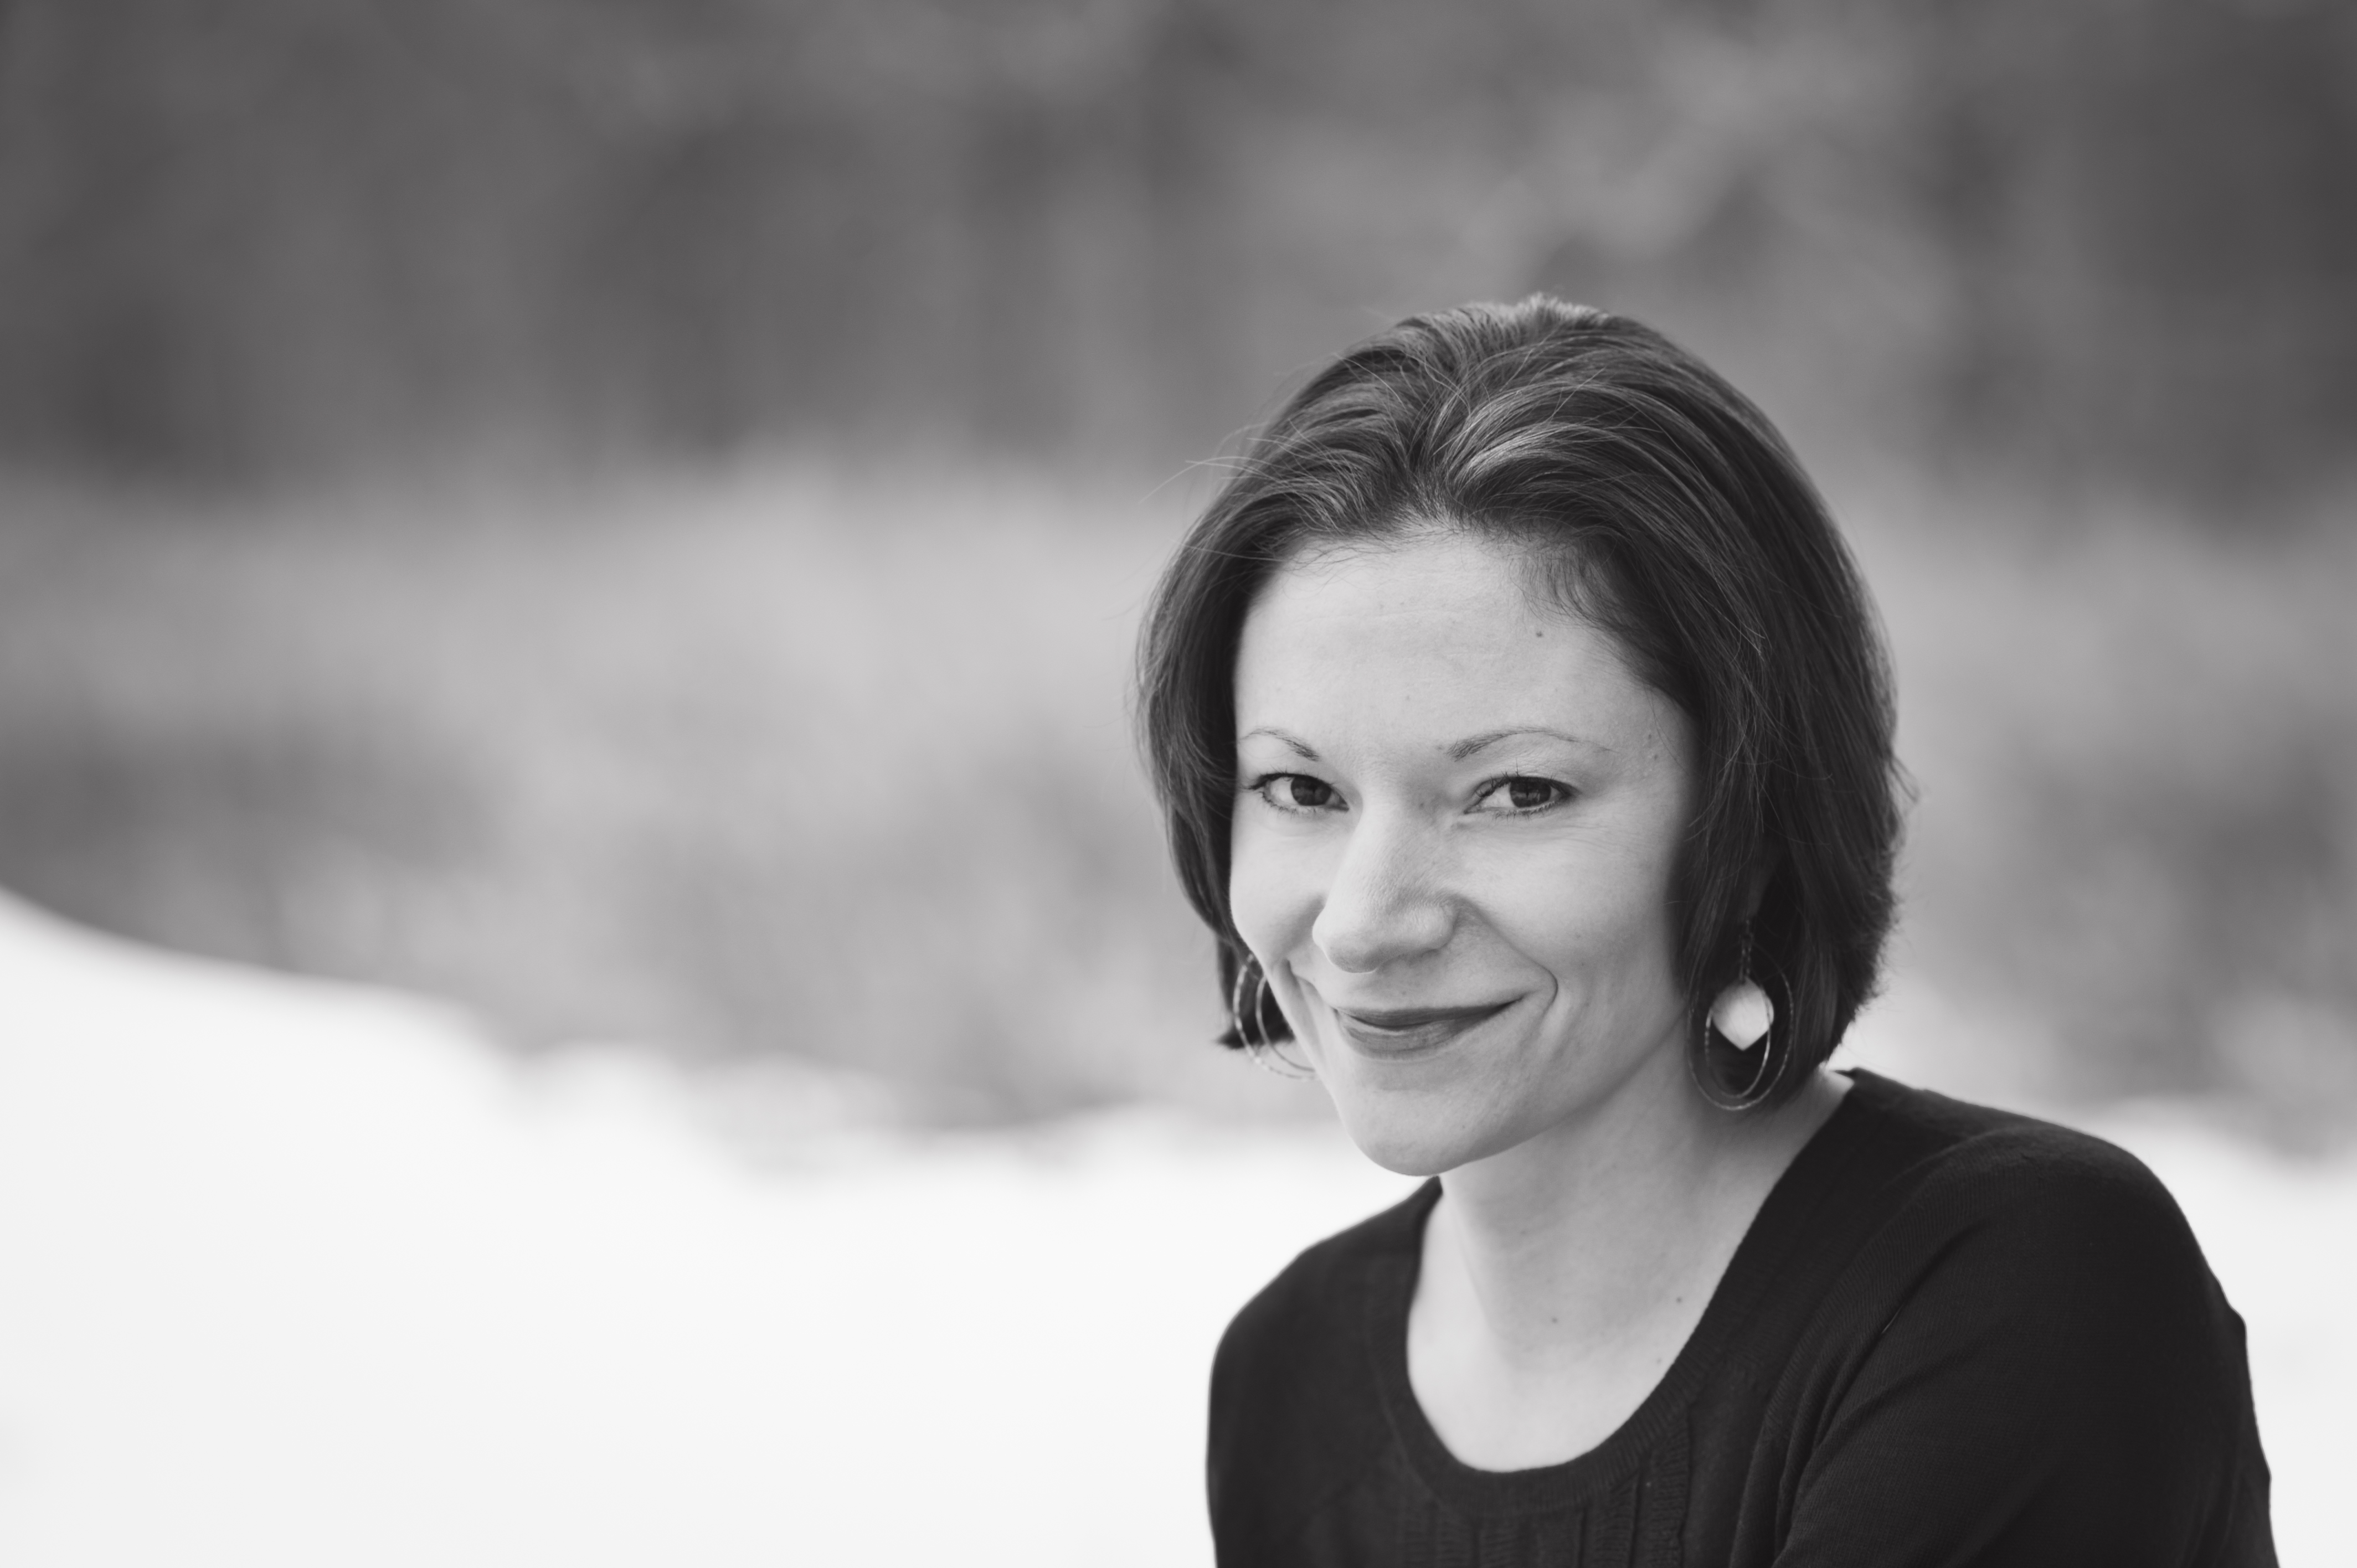 Sarah Lehberger - Brave & Bright Spotlight